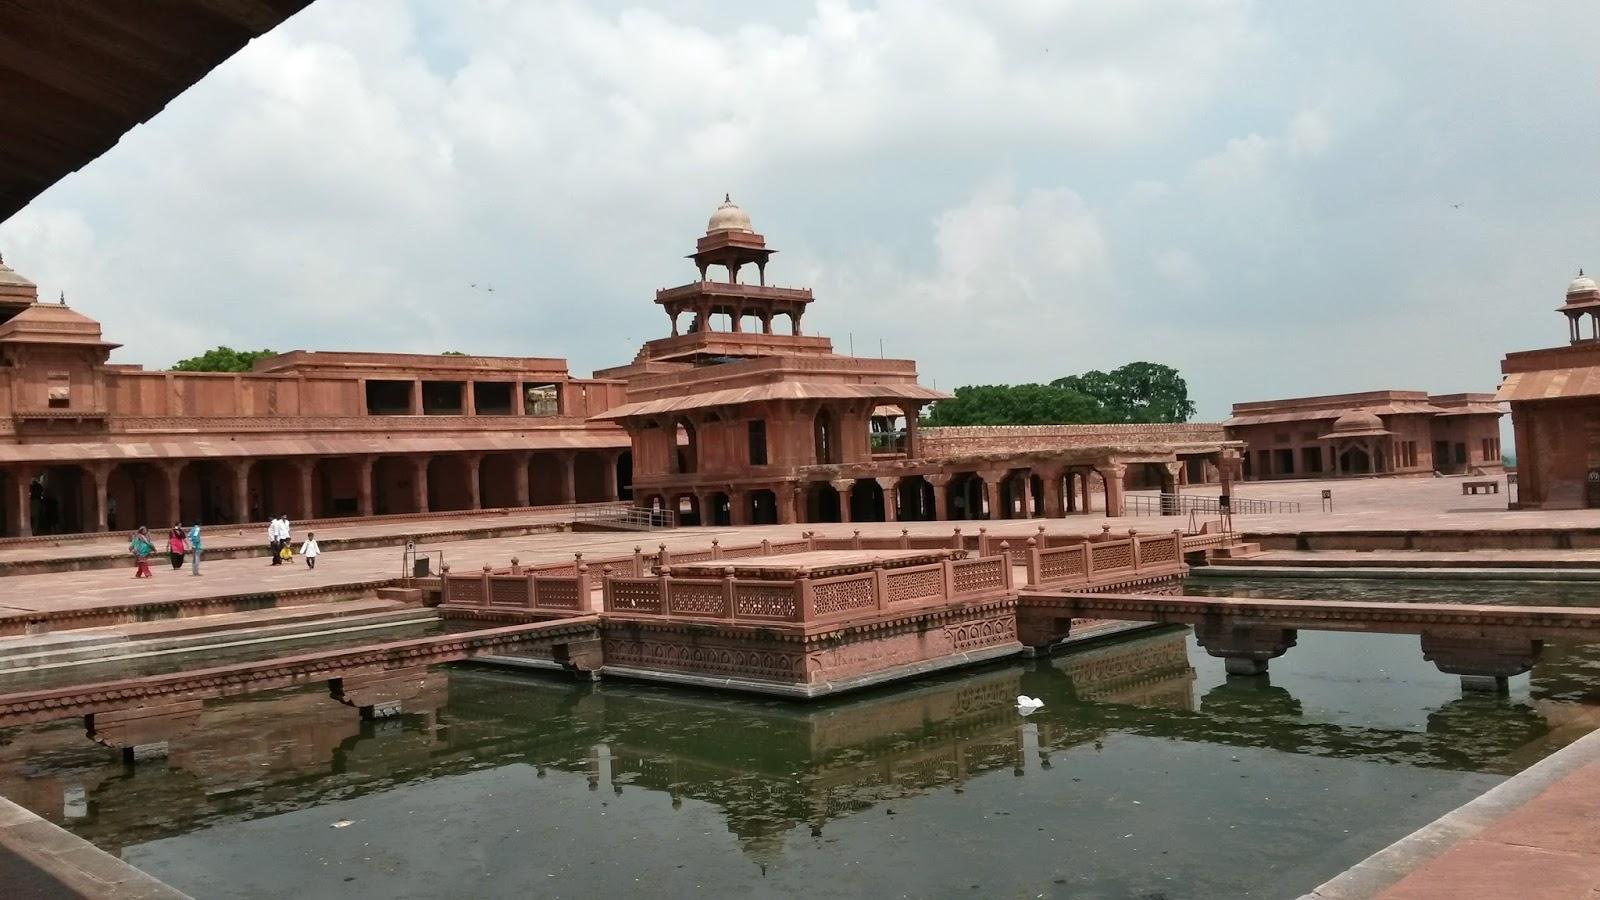 anup talao fatehpur sikri agra hindistan india